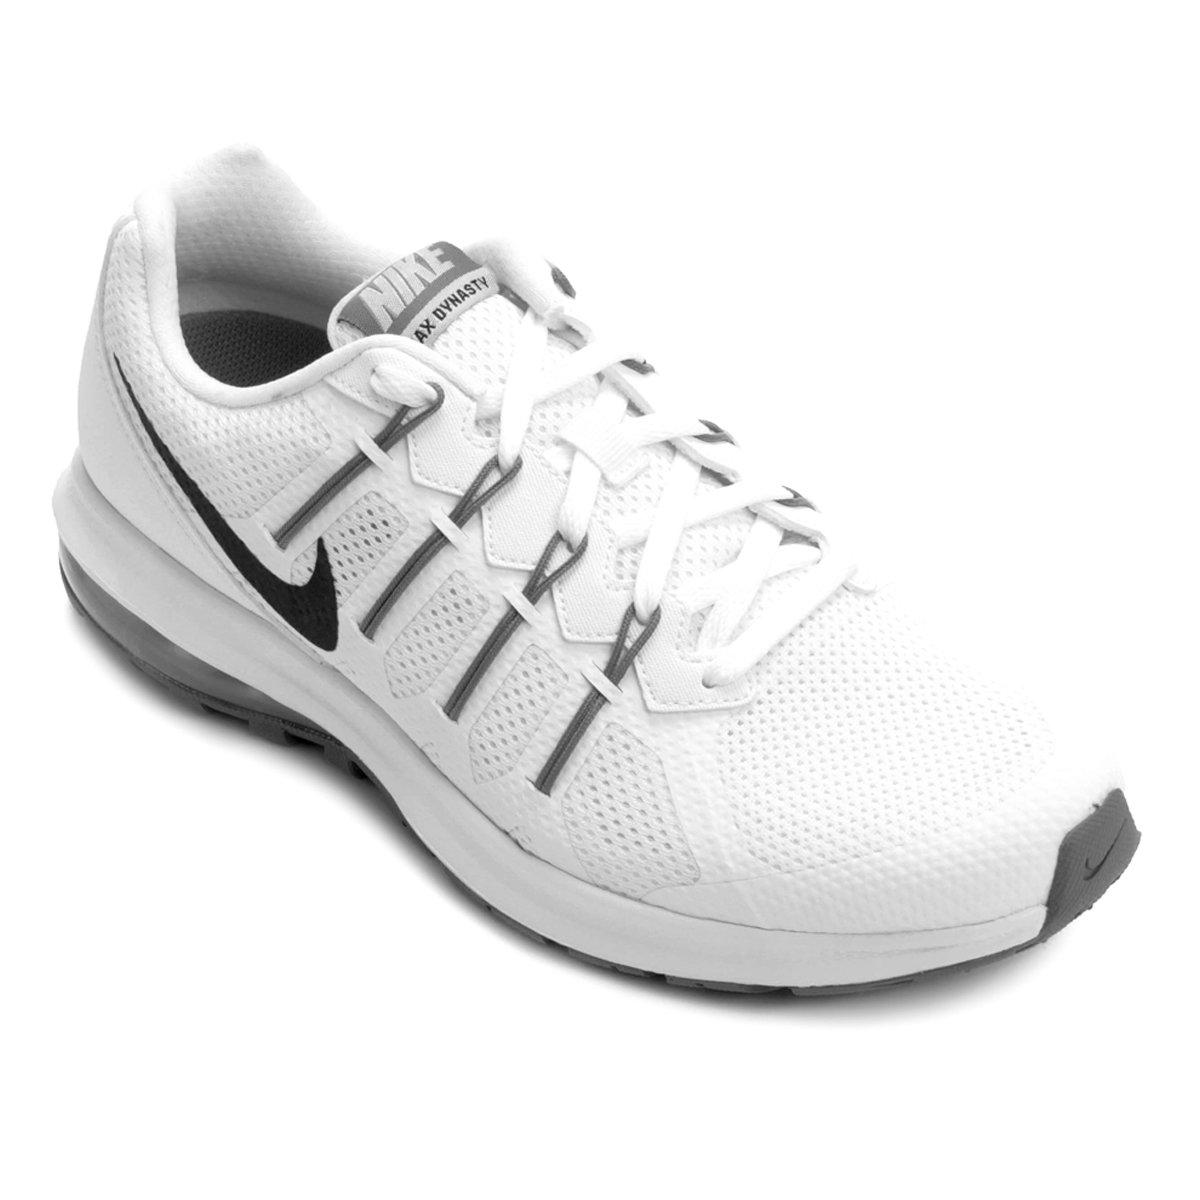 23960b5e0fe Tênis Nike Air Max Dynasty MSL Masculino - Compre Agora